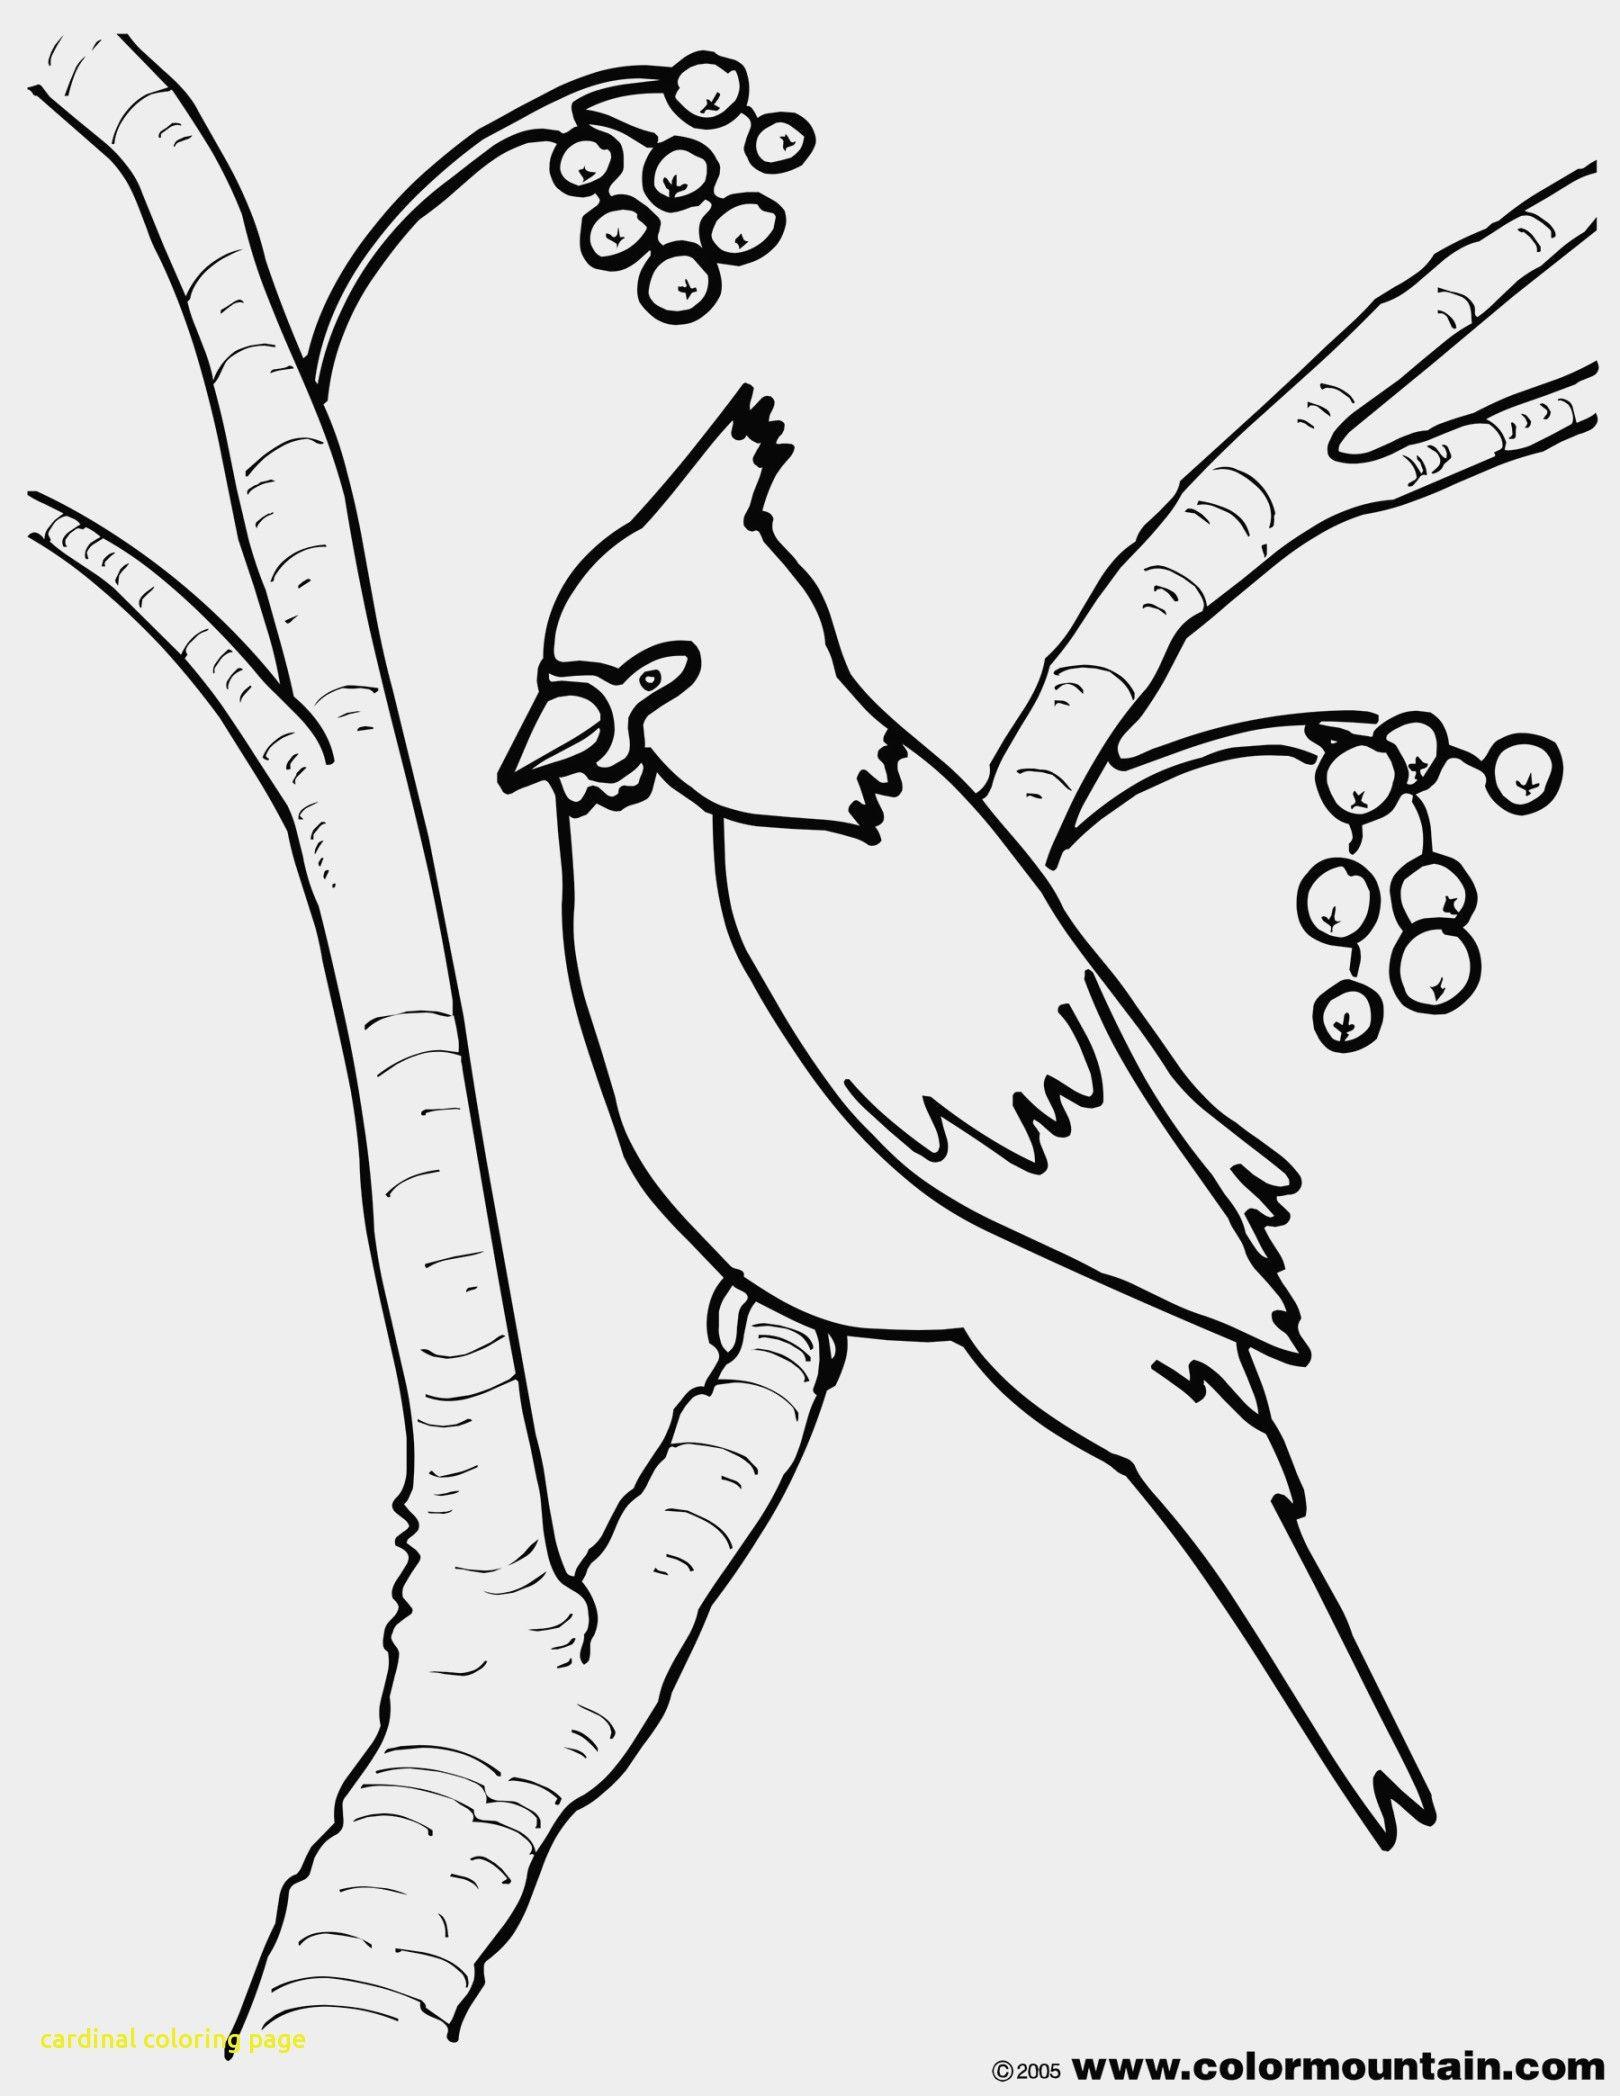 1620x2096 Shocking St Louis Cardinals Logo Coloring Page Supercoloring Diy